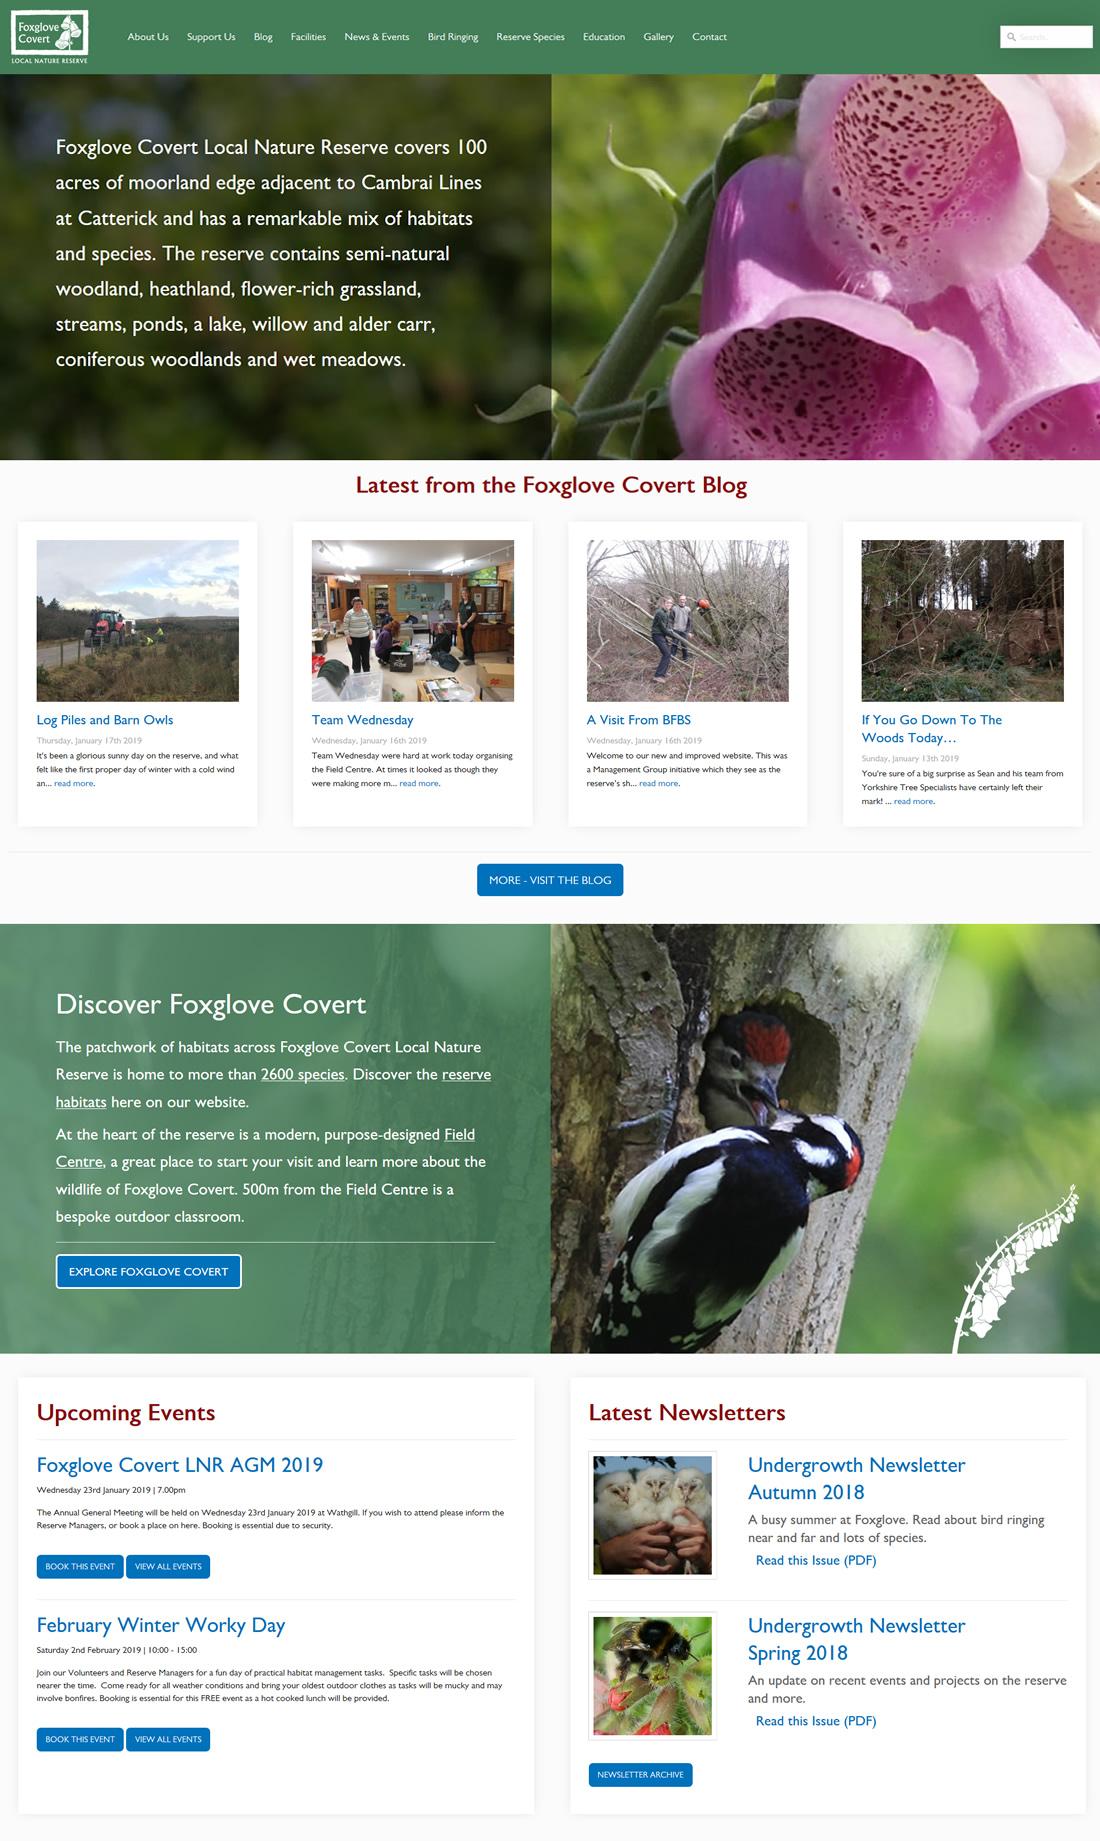 Foxglove Covert LNR The Foxglove Covert Local Nature Reserve home page